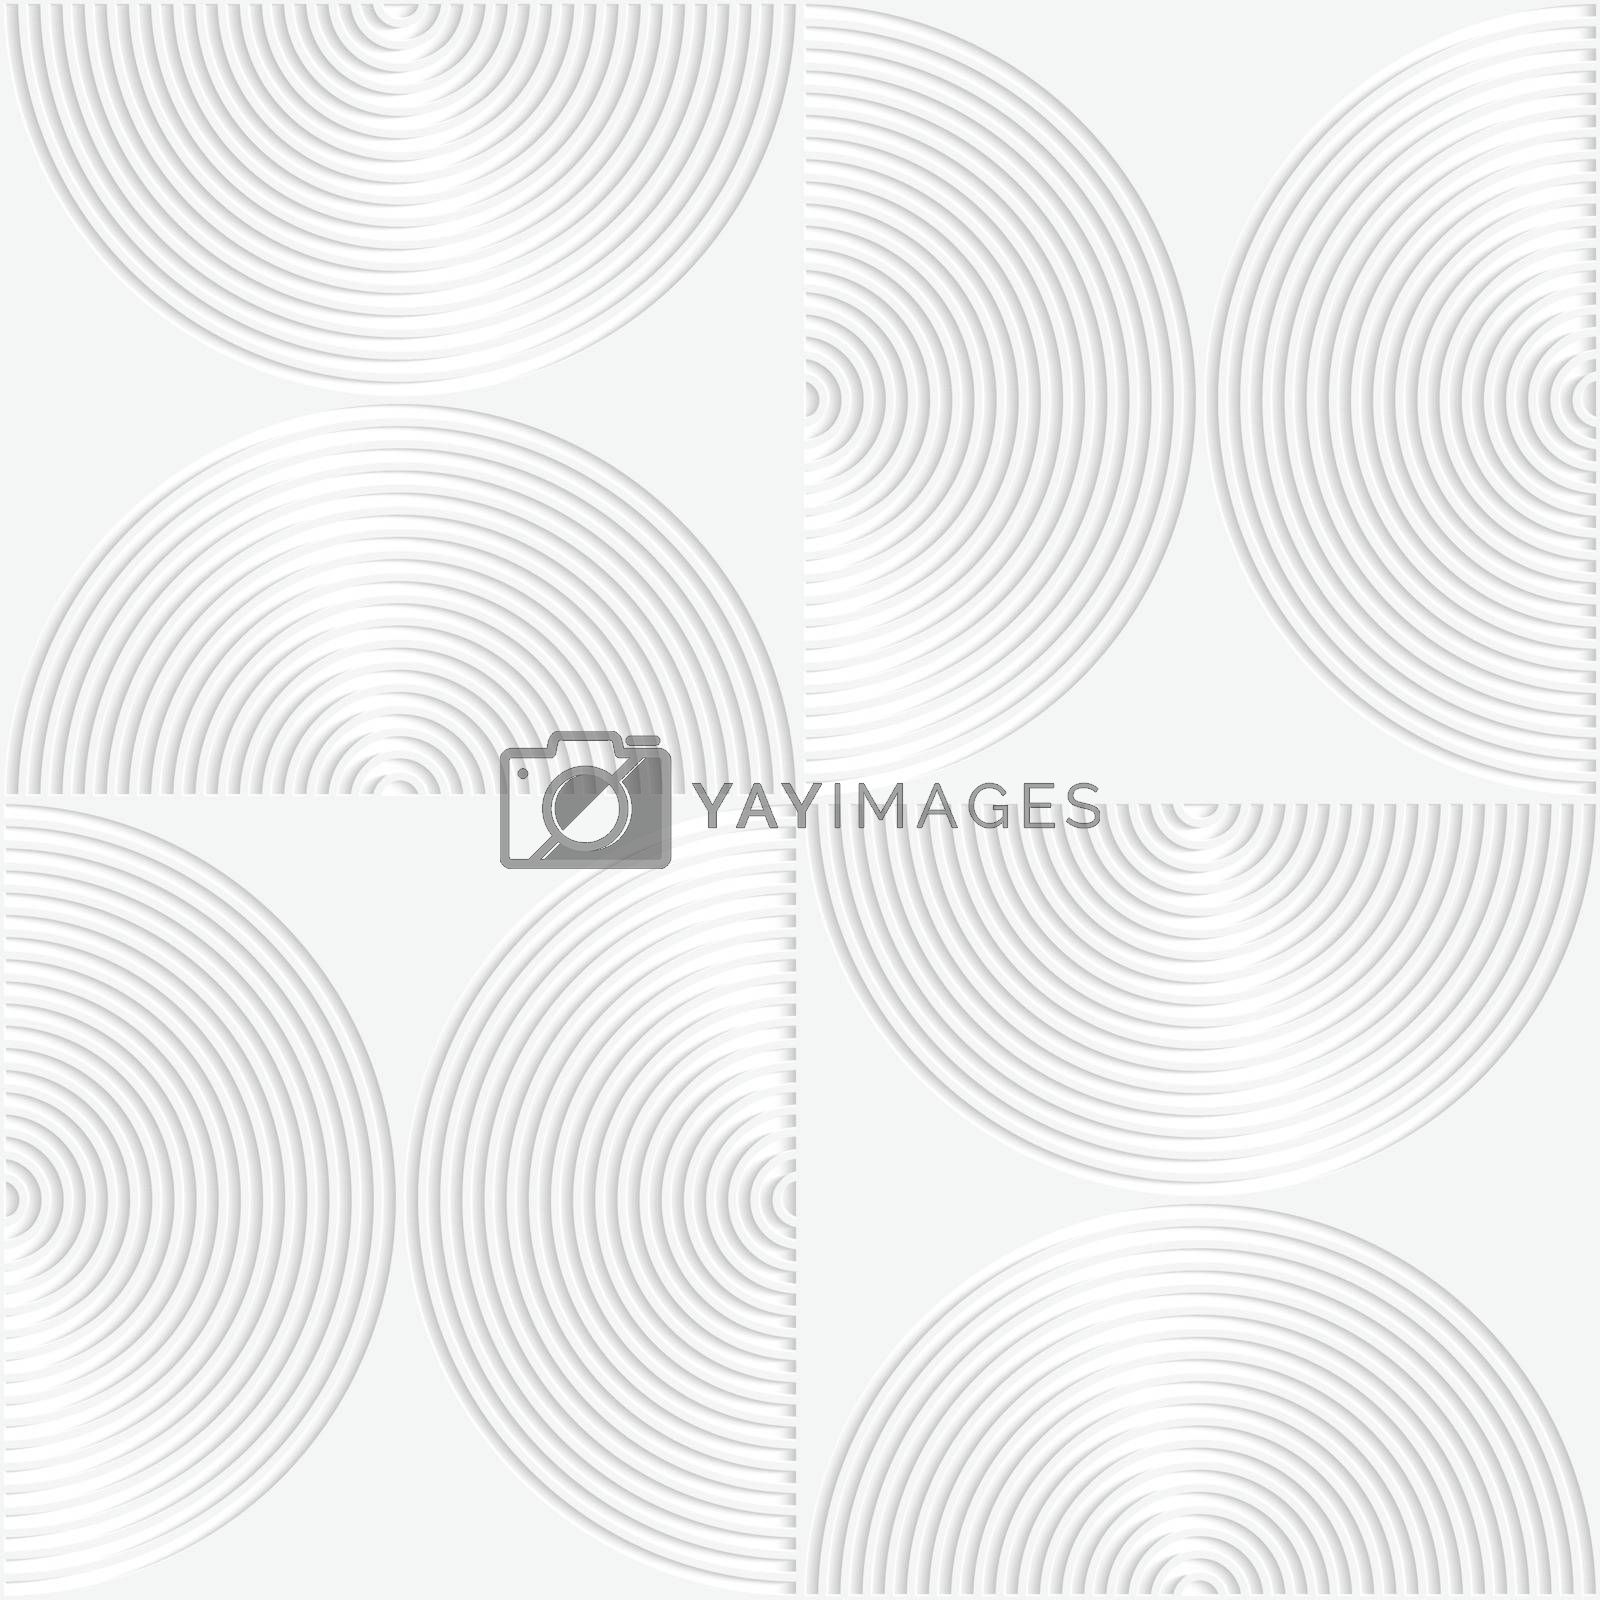 White paper 3D striped semi circles by Zebra-Finch